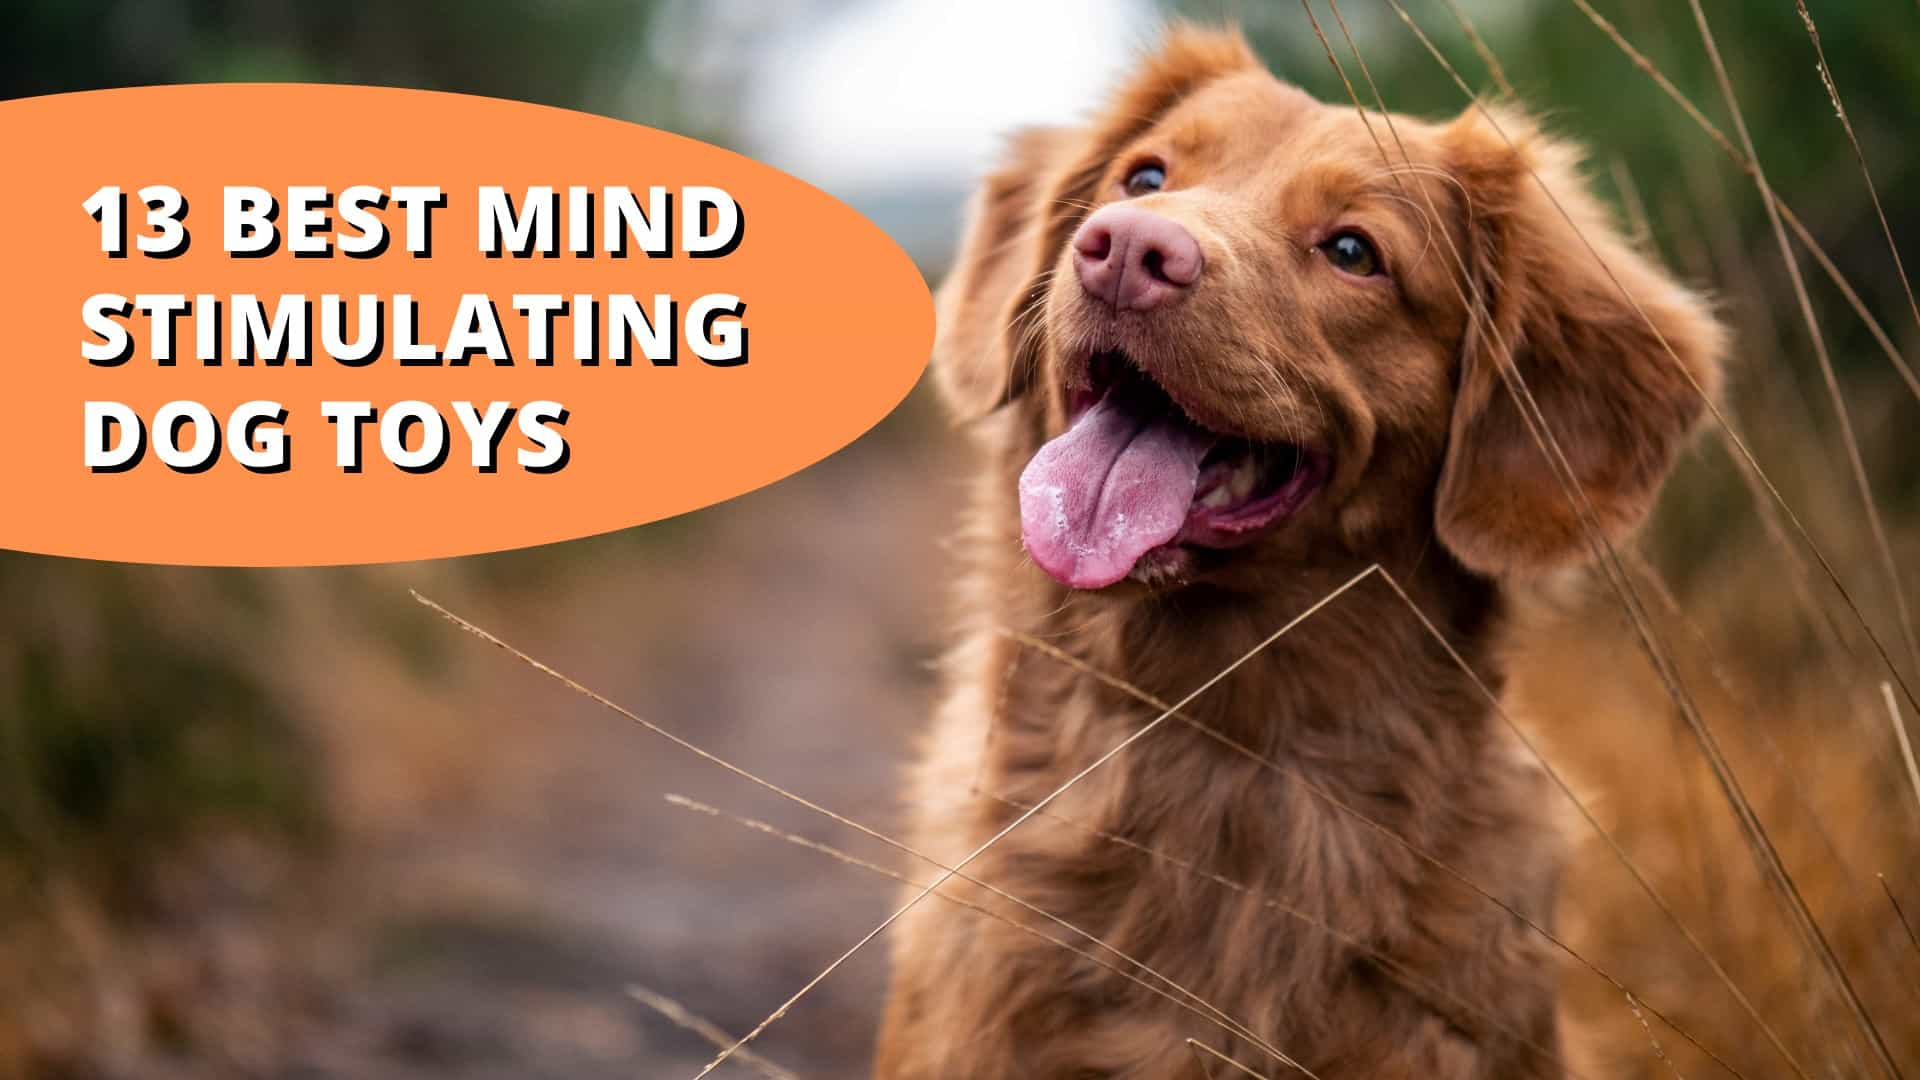 Best mind stimulating dog toys